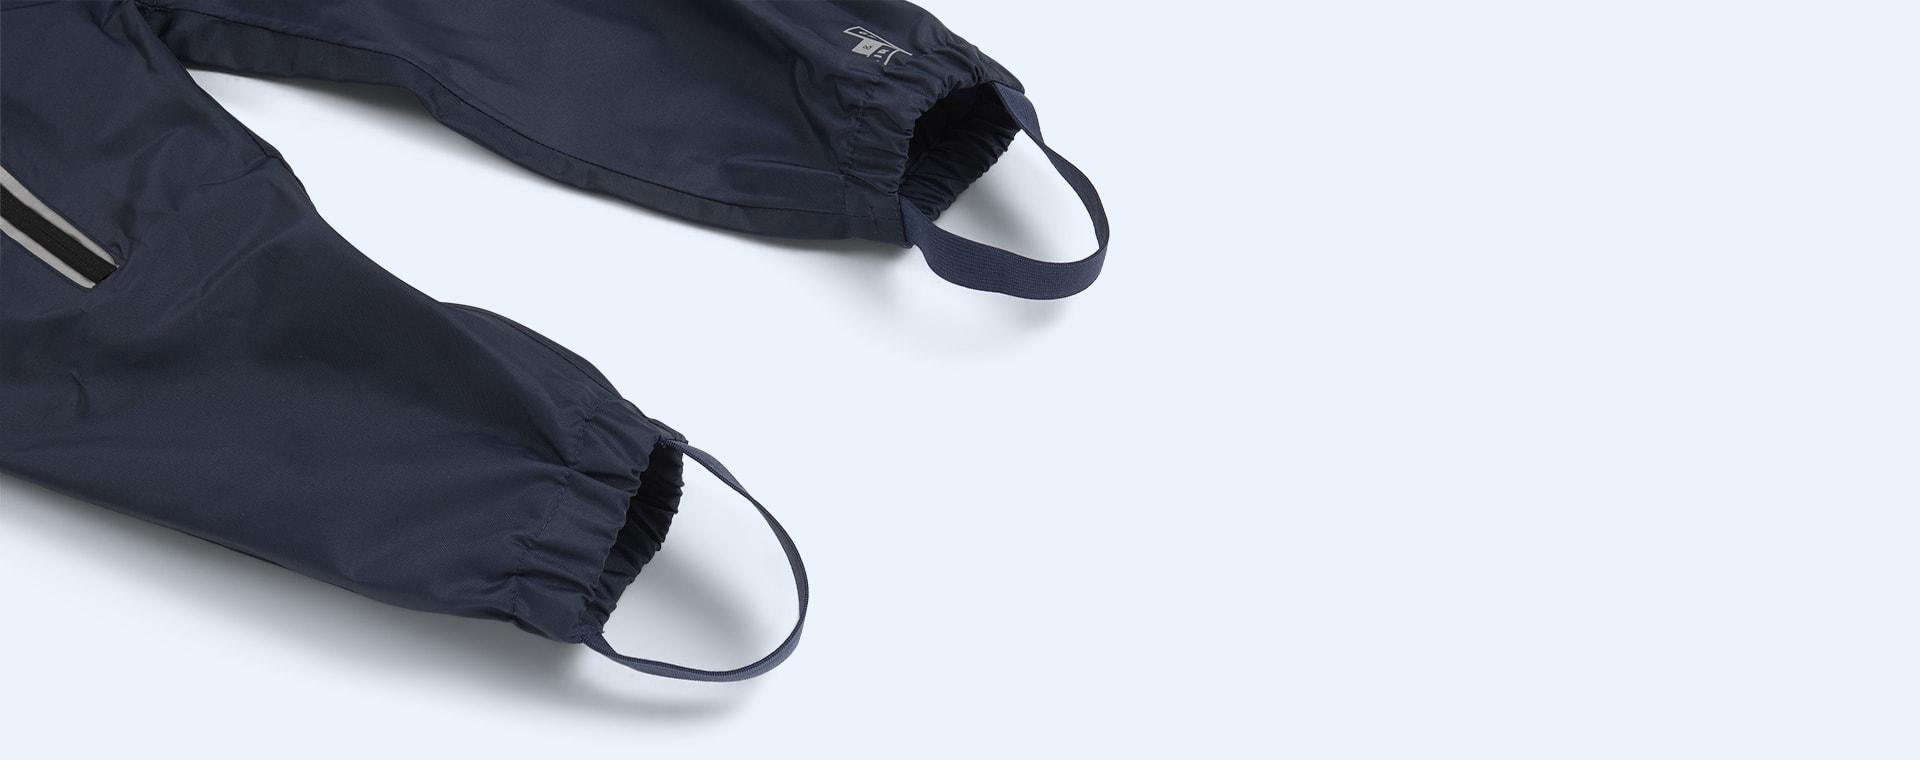 Navy Grass & Air Stomper Suit